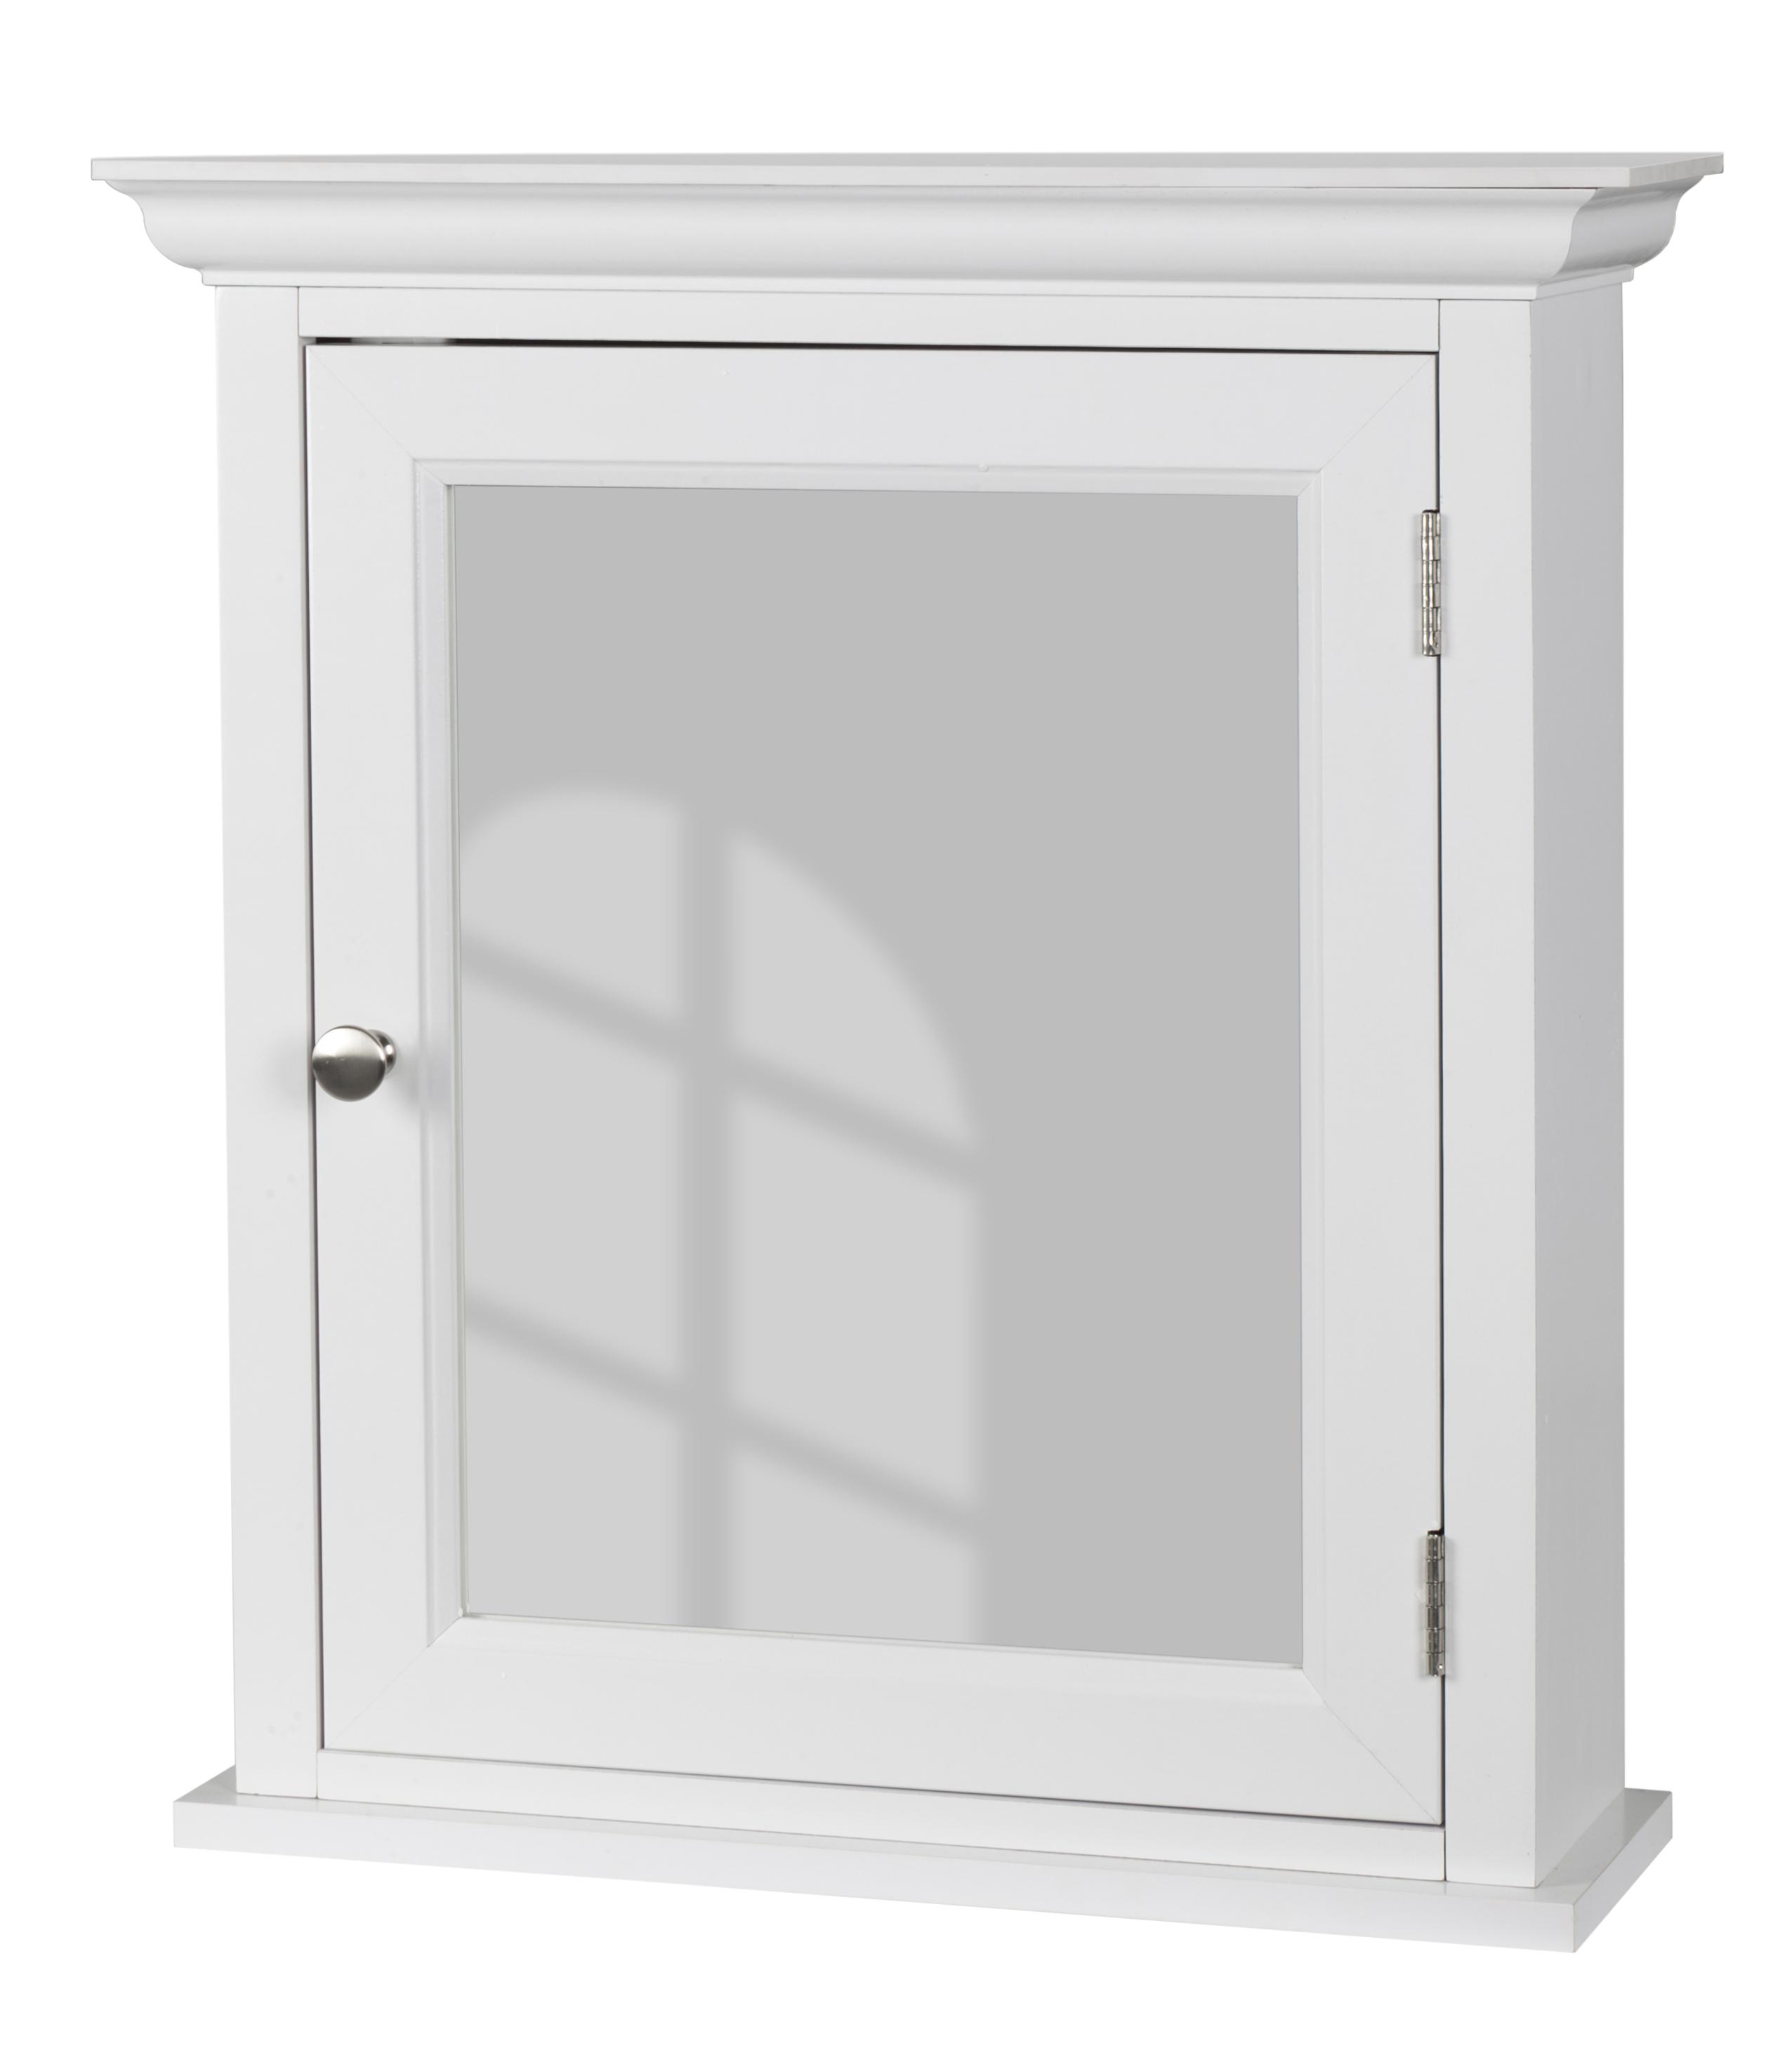 Bathroom Cabinets Kmart bathroom cabinets - kmart